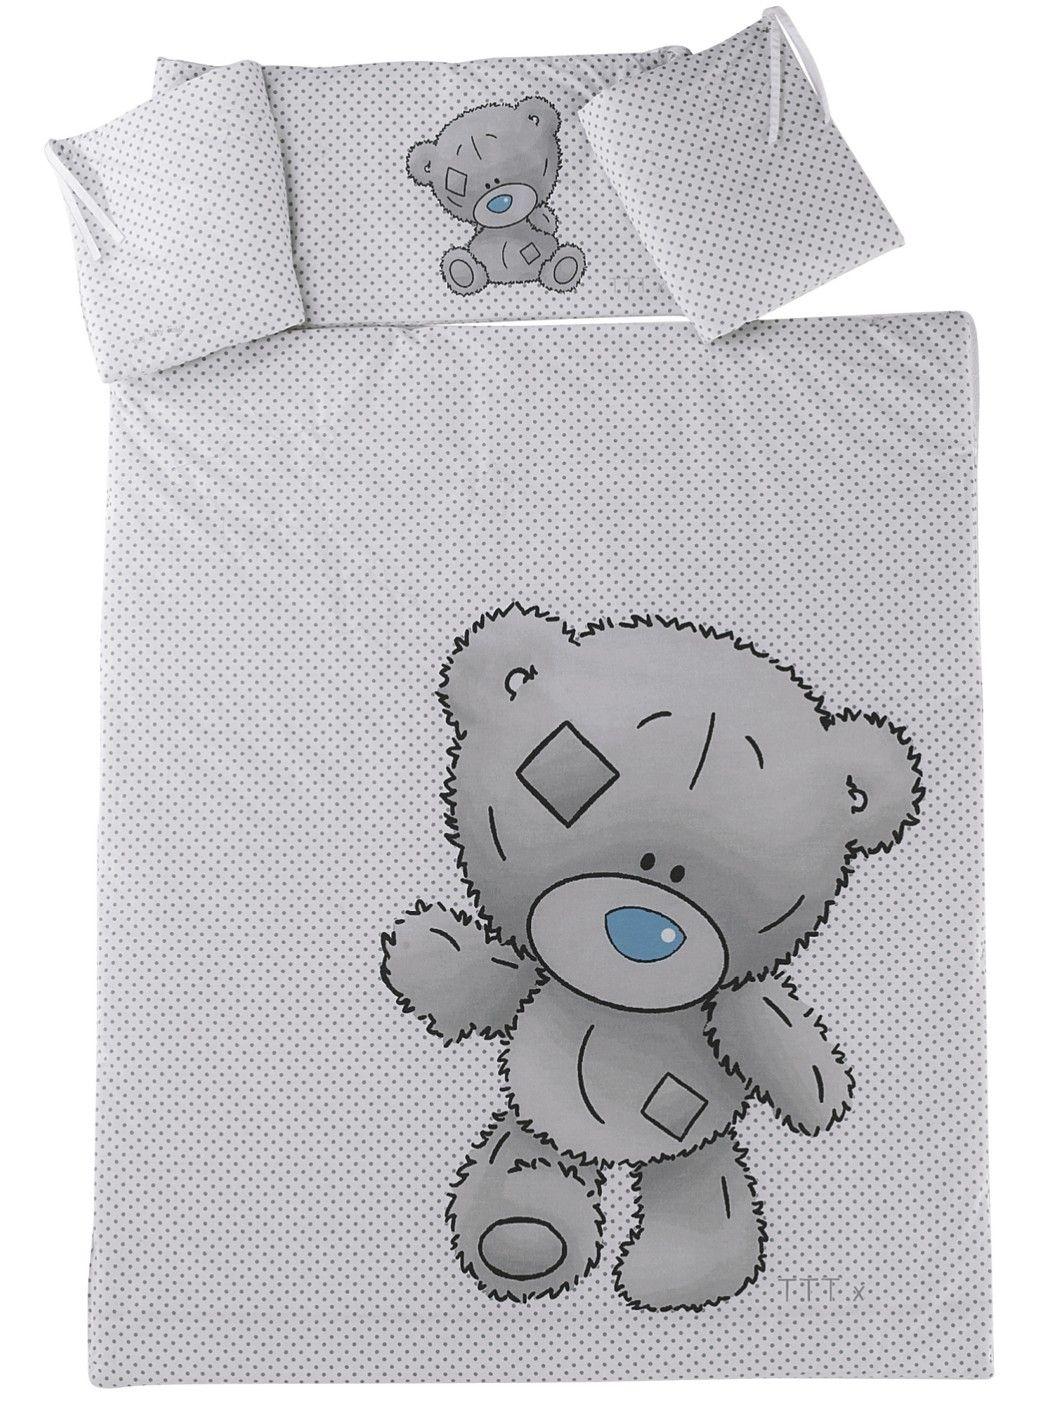 Woolworths Teddy bear nursery, Teddy bear